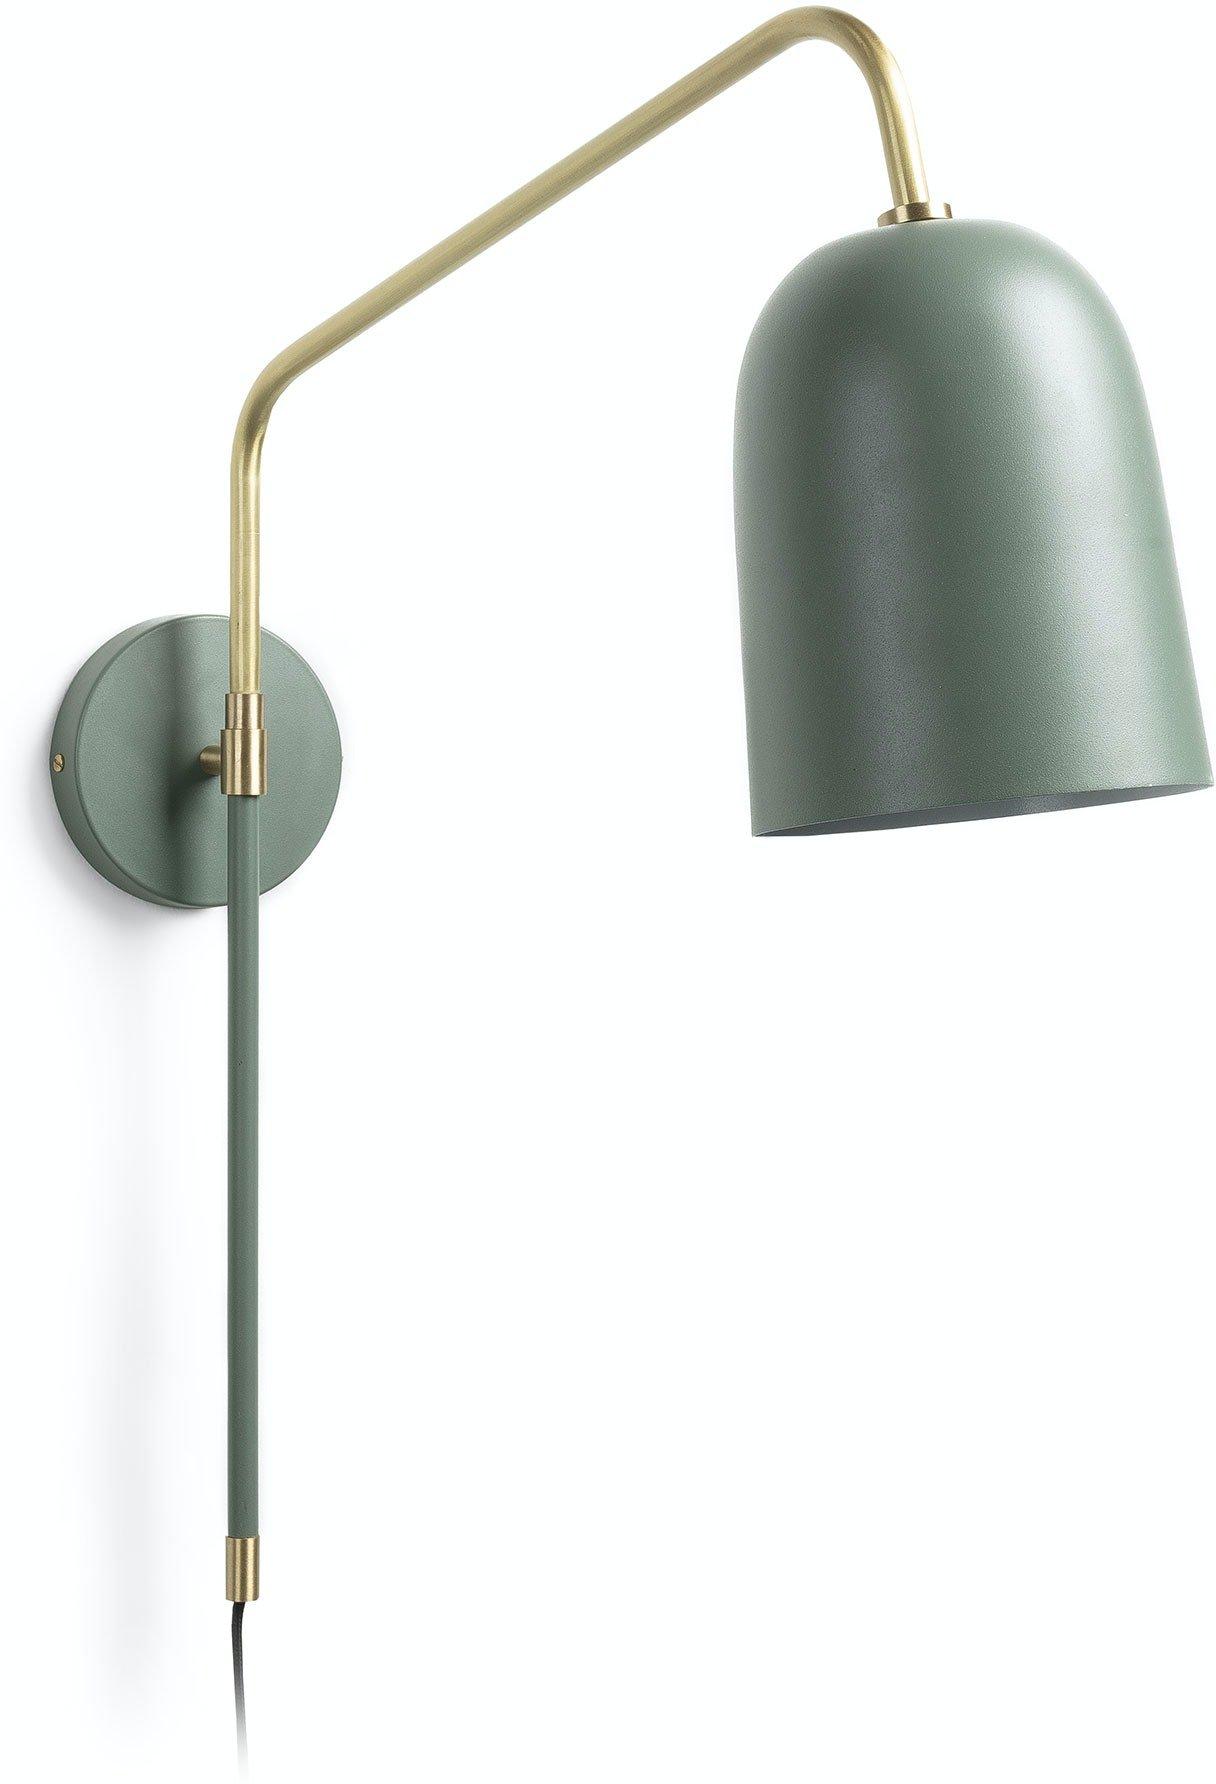 Køb Audrie, Væglampe by LaForma (H: 60 cm. B: 58 cm. L: 15 cm., Grøn/Guld)